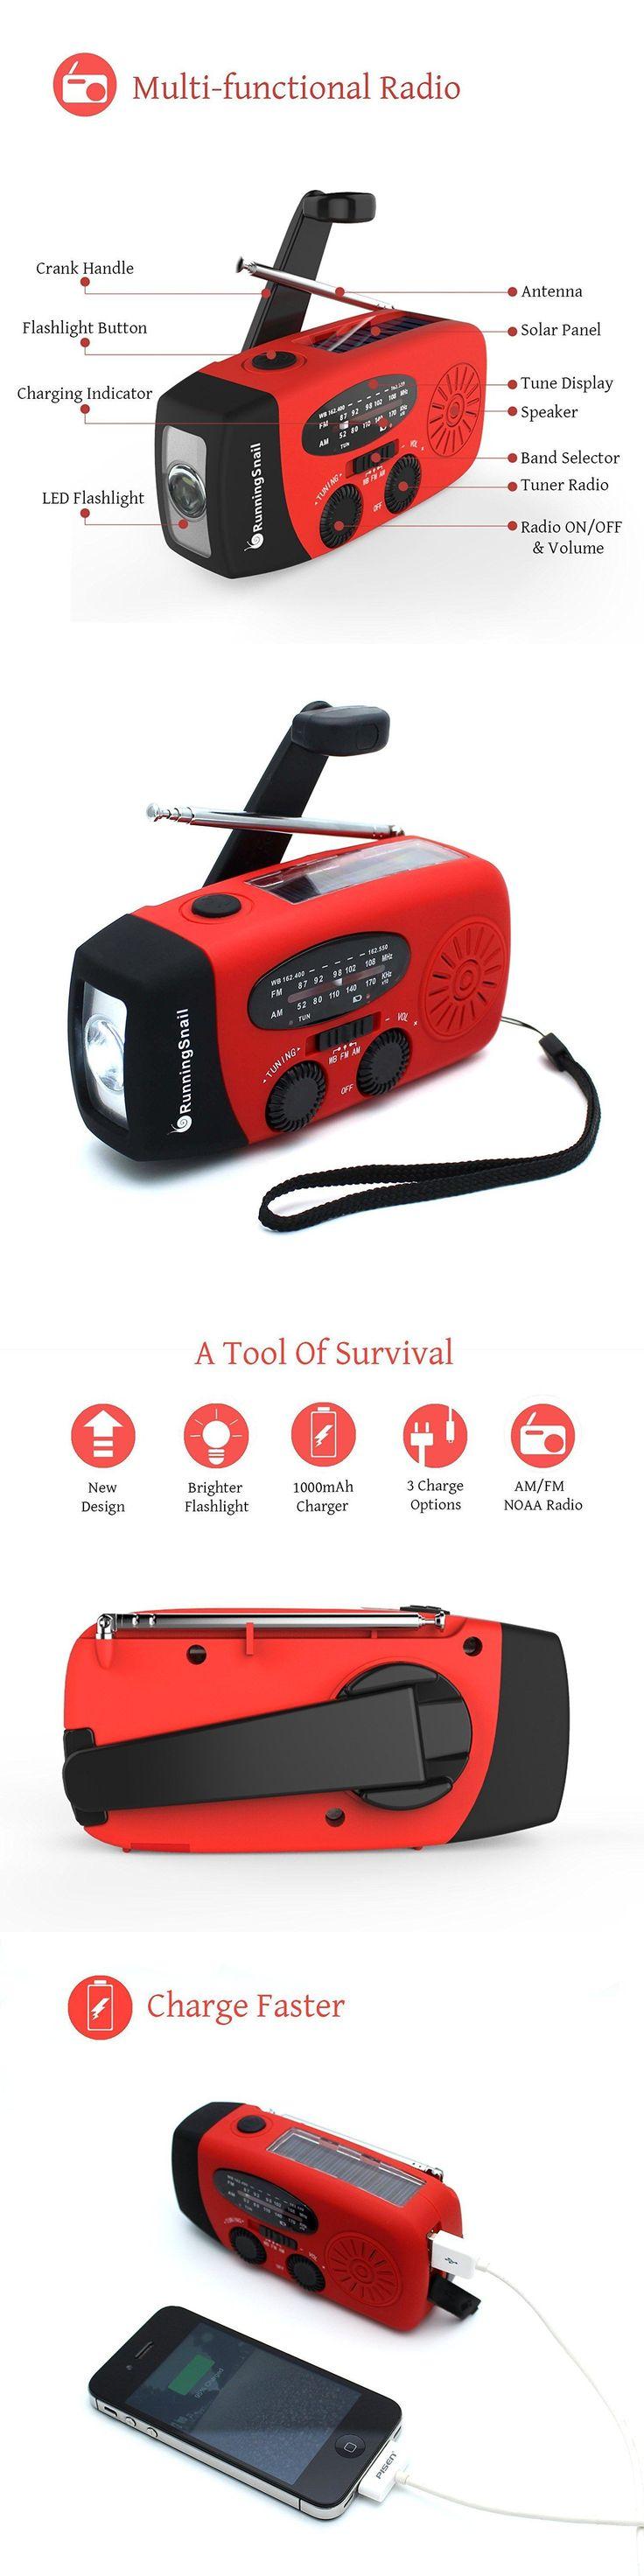 Portable AM FM Radios: Runningsnail Solar Crank Noaa Weather Radio Emergency Tornado Am Fm Power Bank -> BUY IT NOW ONLY: $31.2 on eBay!